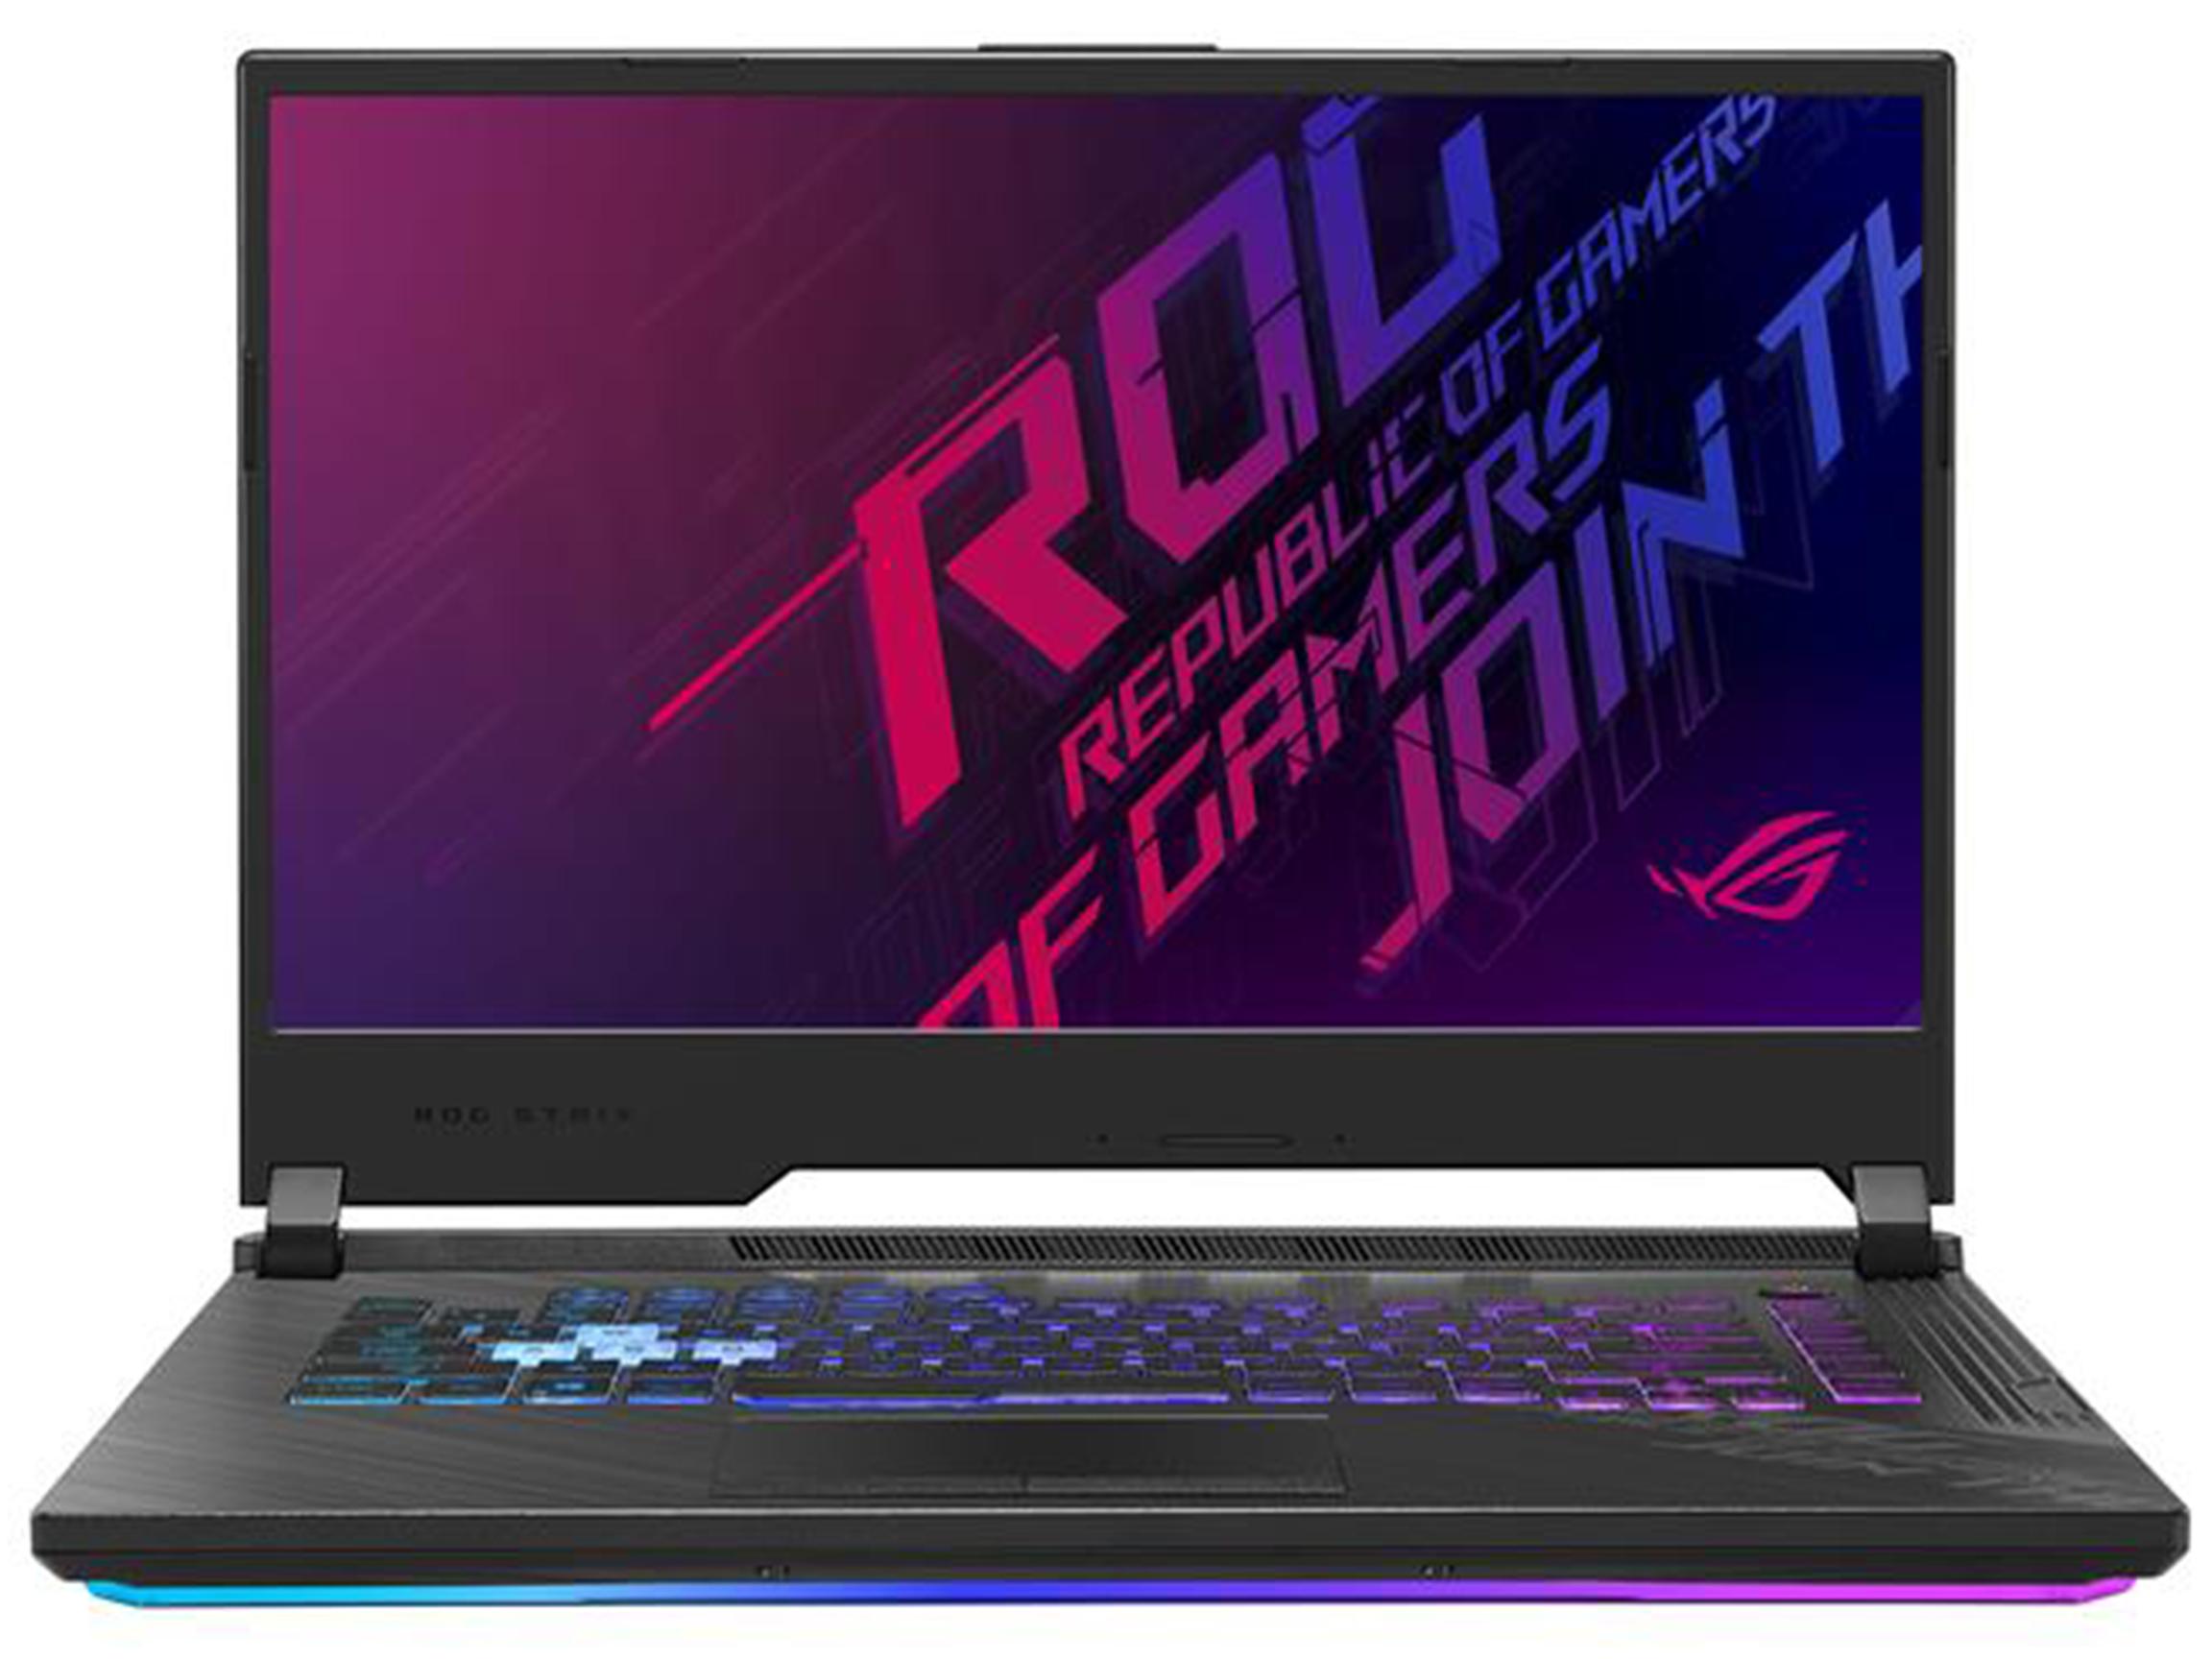 ASUS ROG Strix 15.6 144Hz Intel Core i7-10750H NVIDIA GeForce GTX 1660 Ti 16GB Memory 1TB PCIe SSD Win 10 Home Gaming Laptop, G512LU-DS71-CA